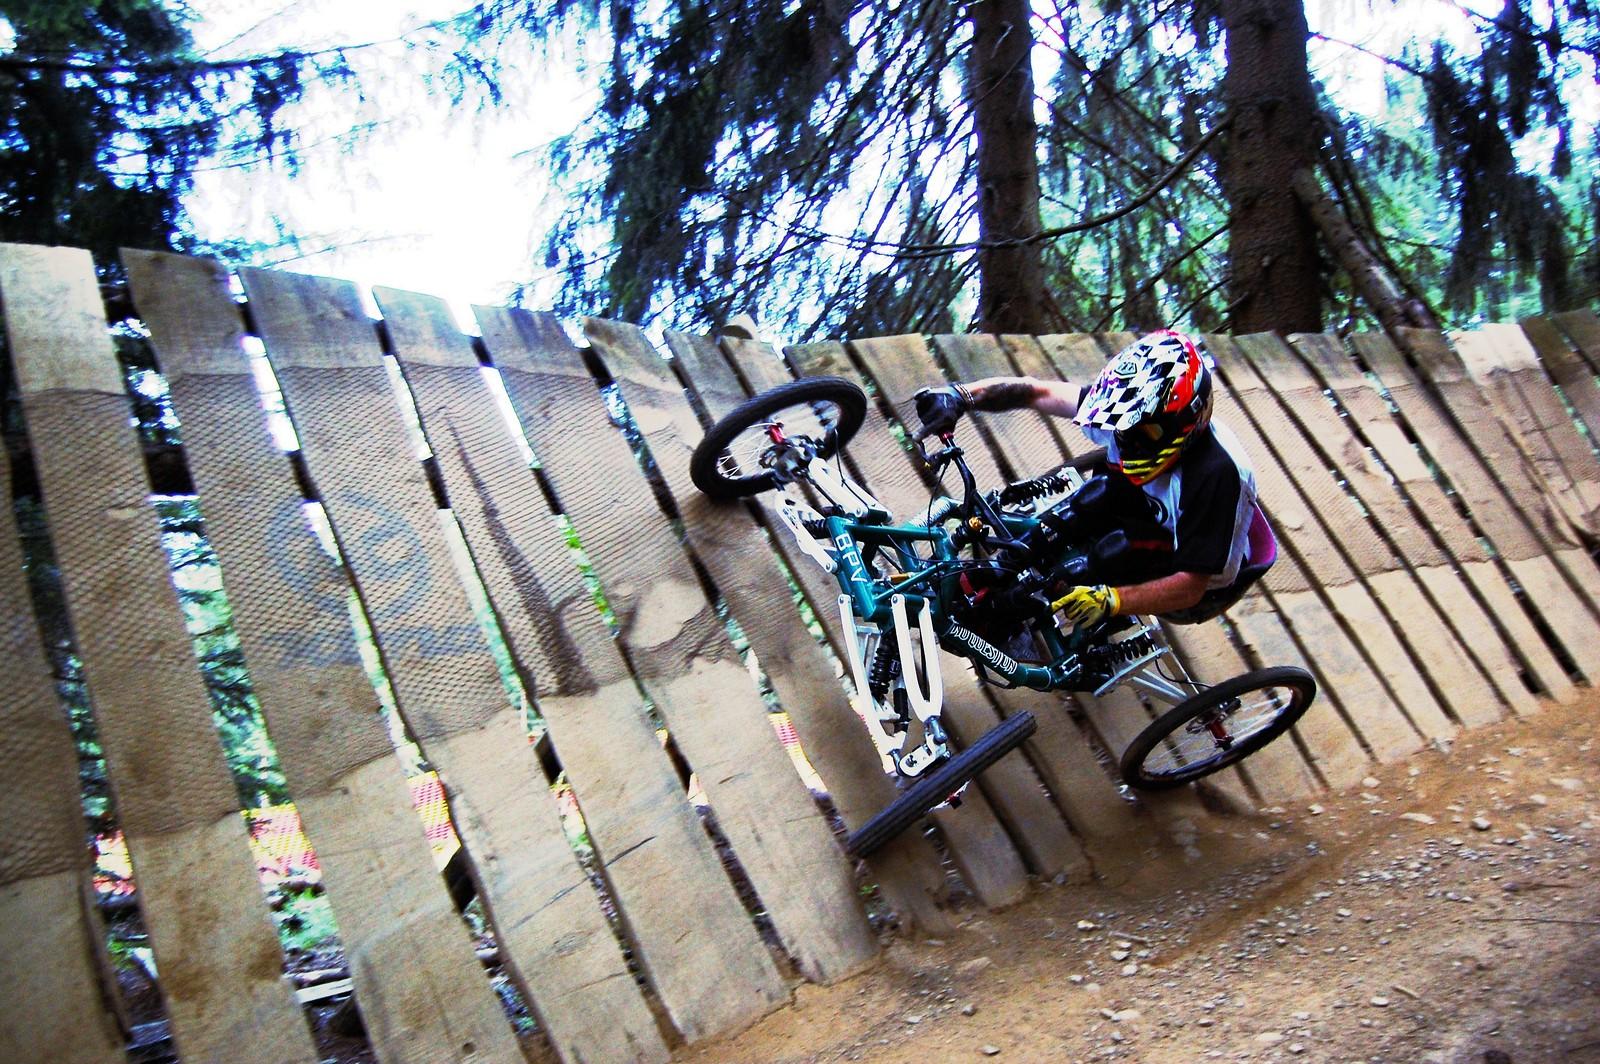 DSC 0080u - wozikmajkl83 - Mountain Biking Pictures - Vital MTB